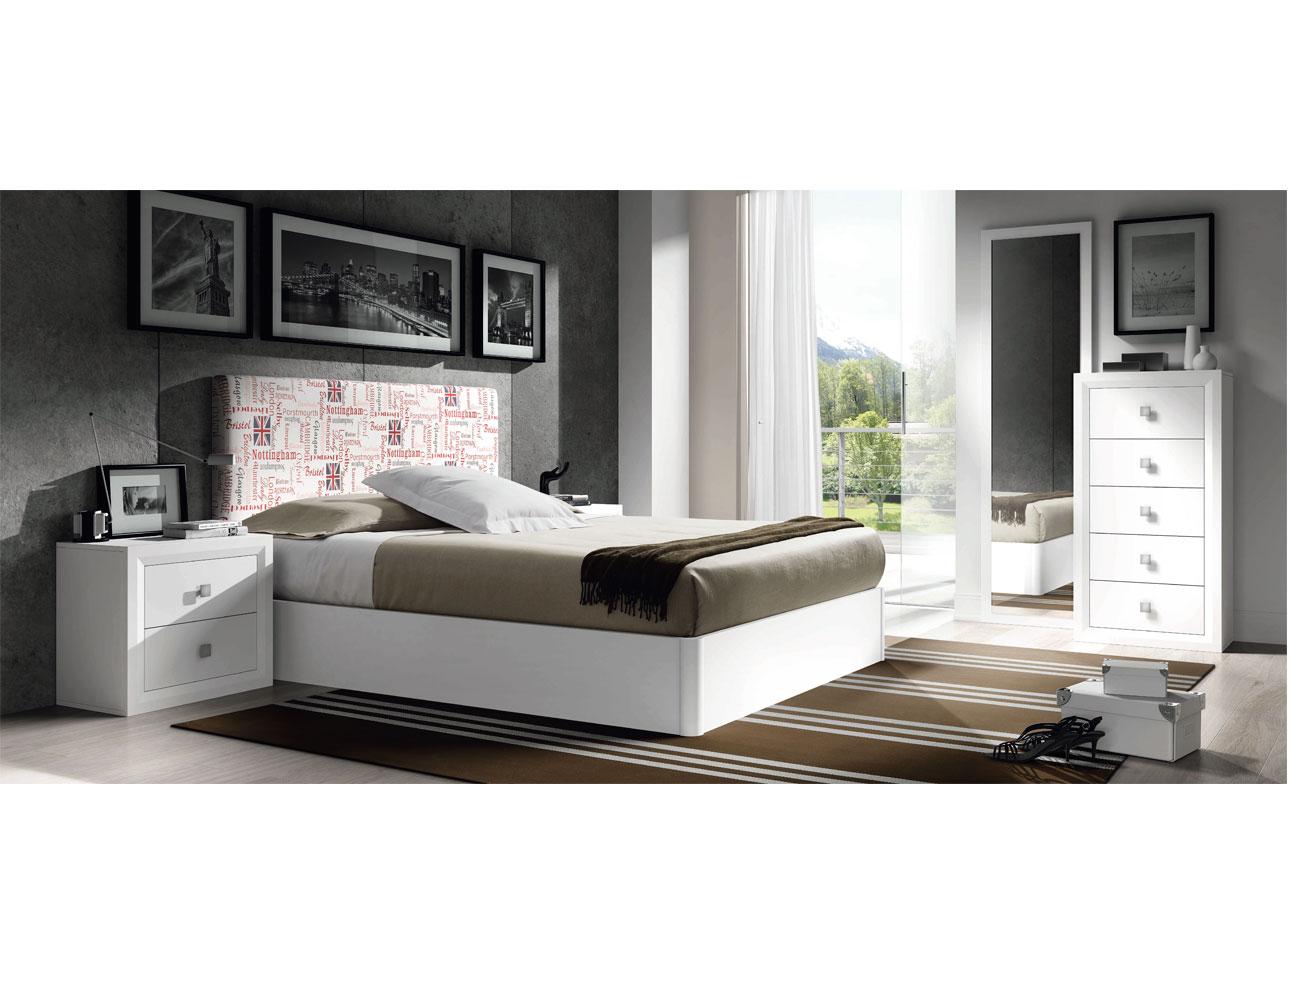 11 dormitorio matrimonio sinfonier blanco artico1